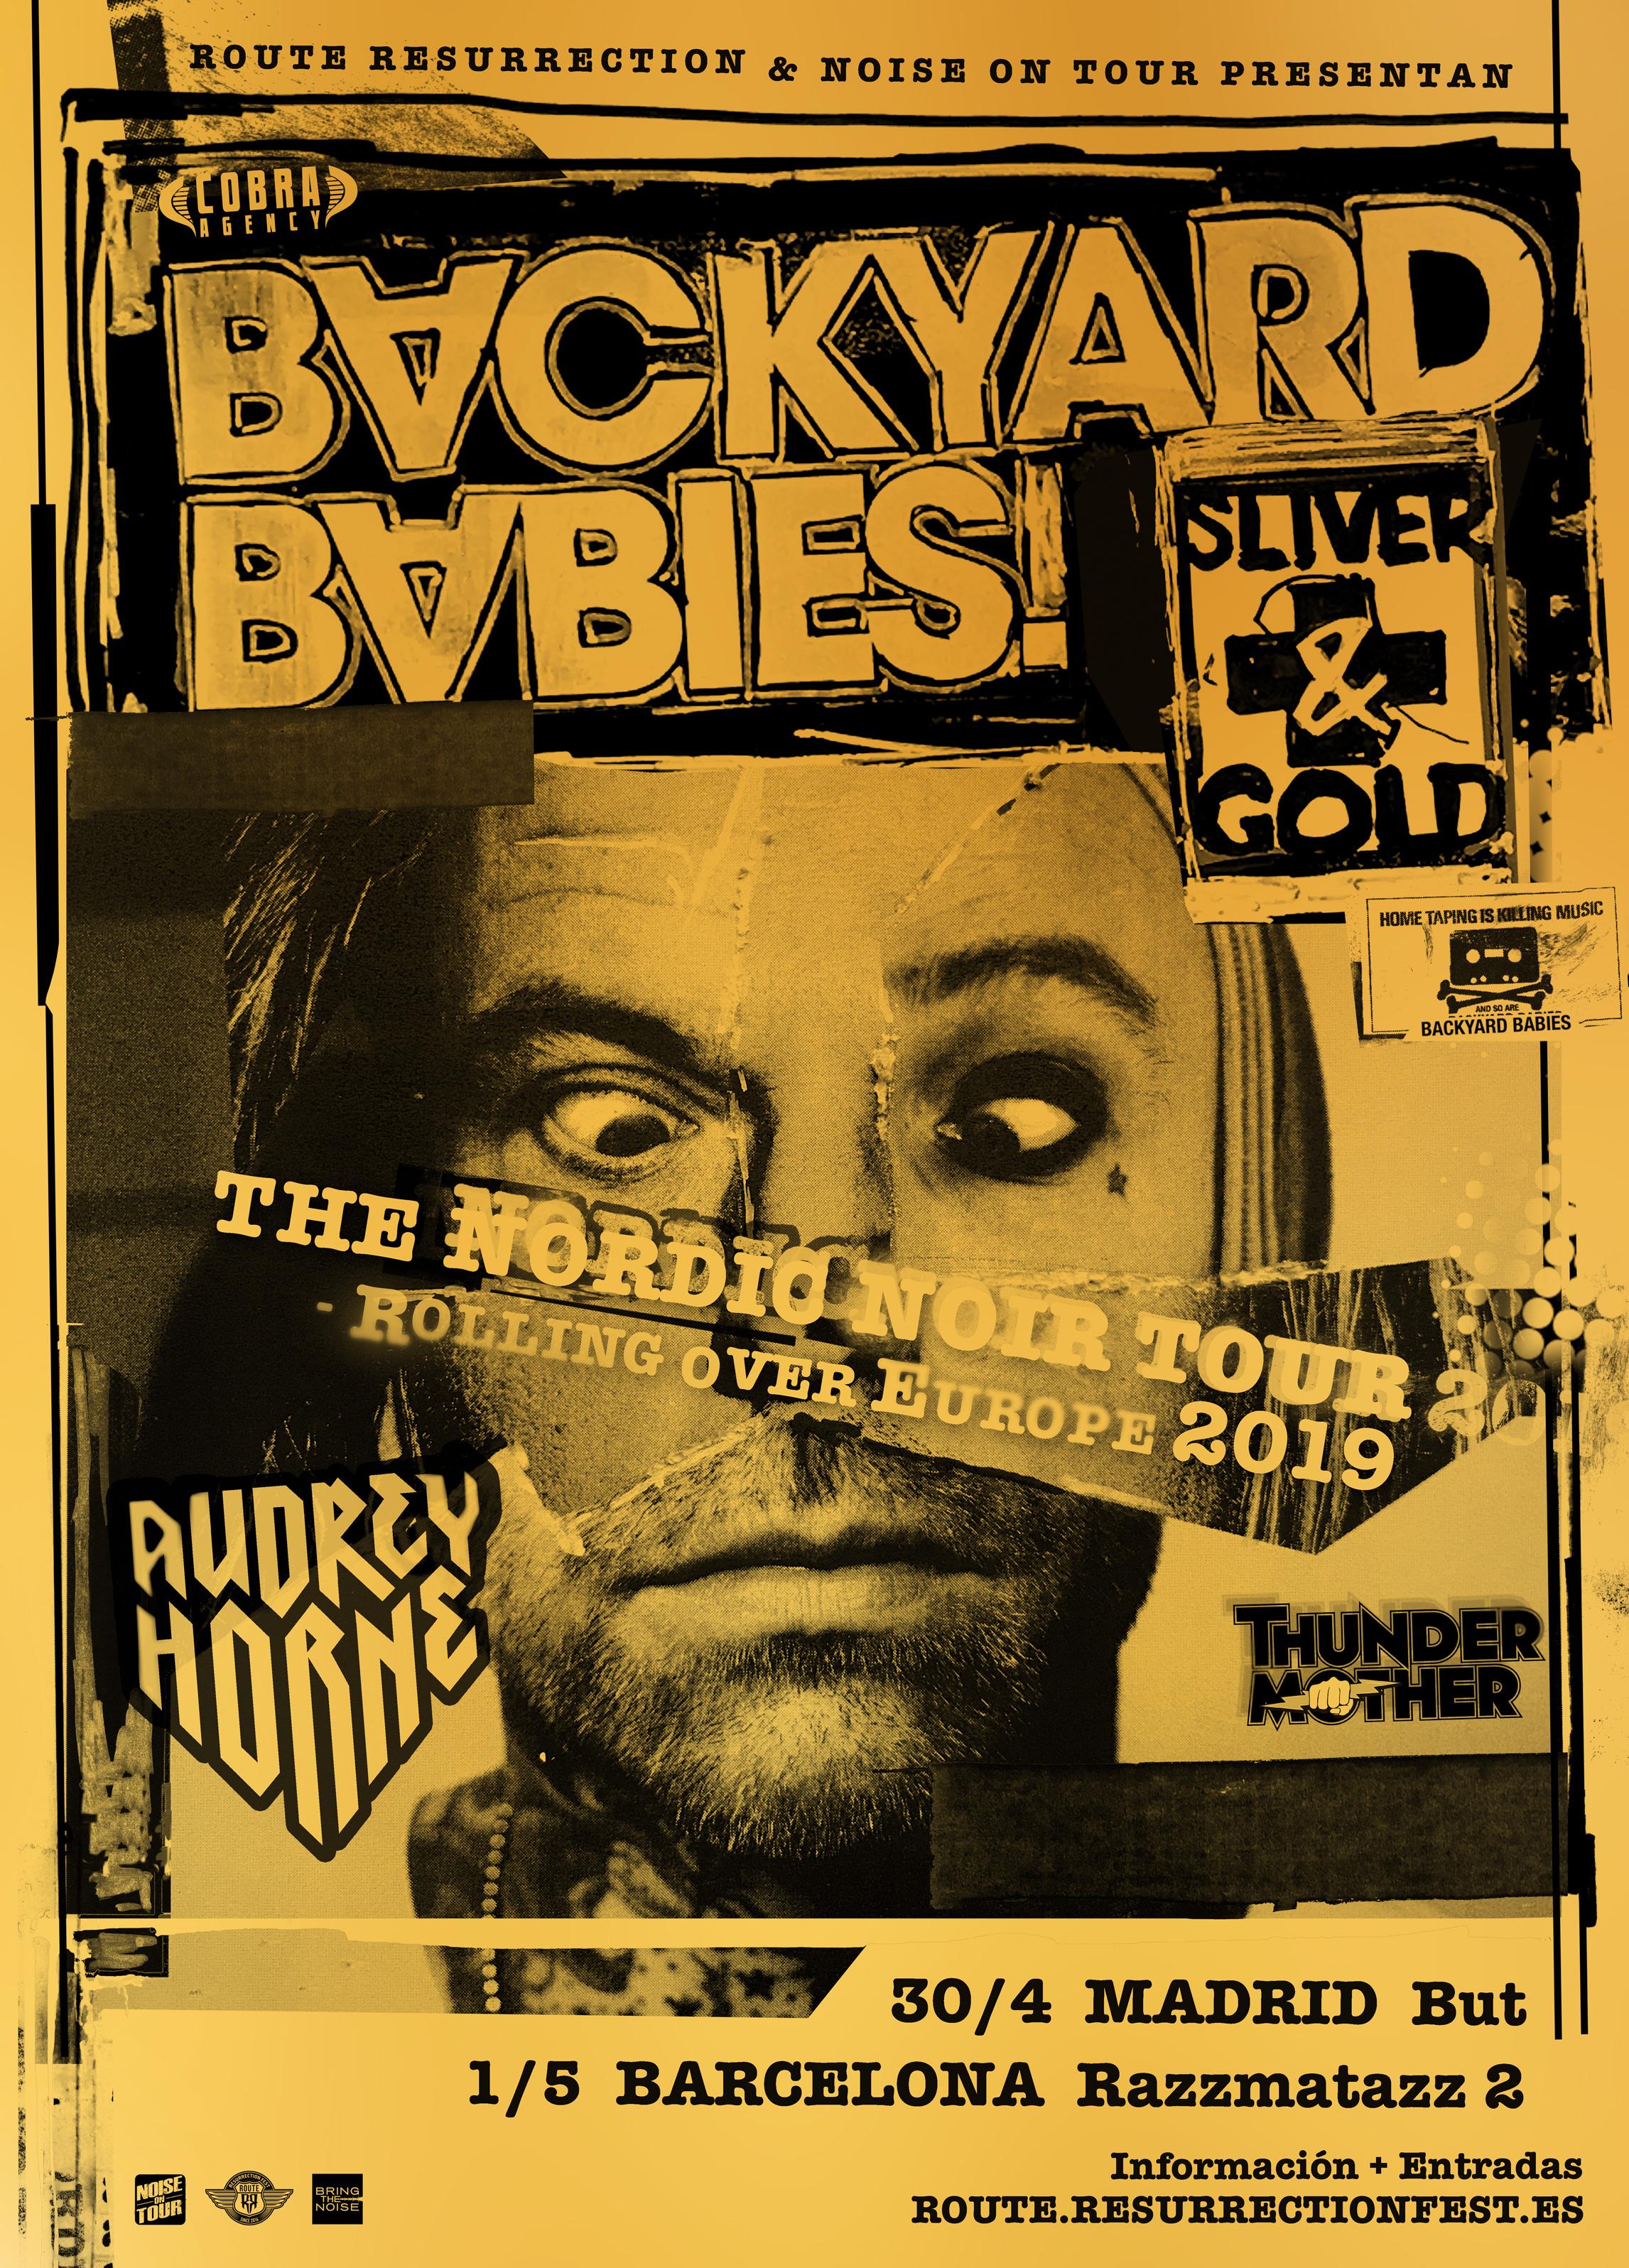 Route Resurrection 2019: Backyard Babies (Barcelona)